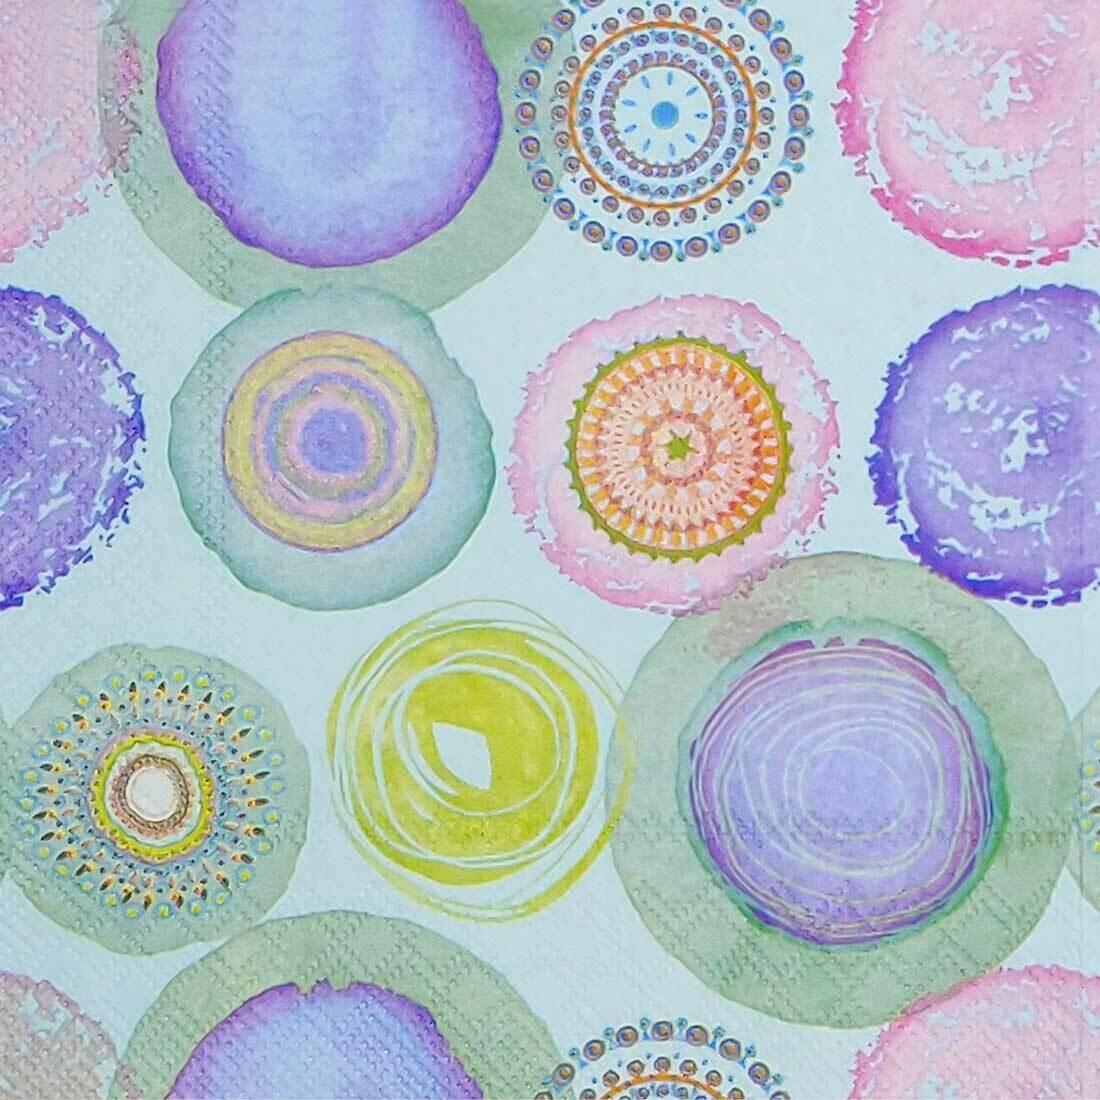 Decoupage Paper Napkins - Watercolor Circles - Blue (1 Sheet)